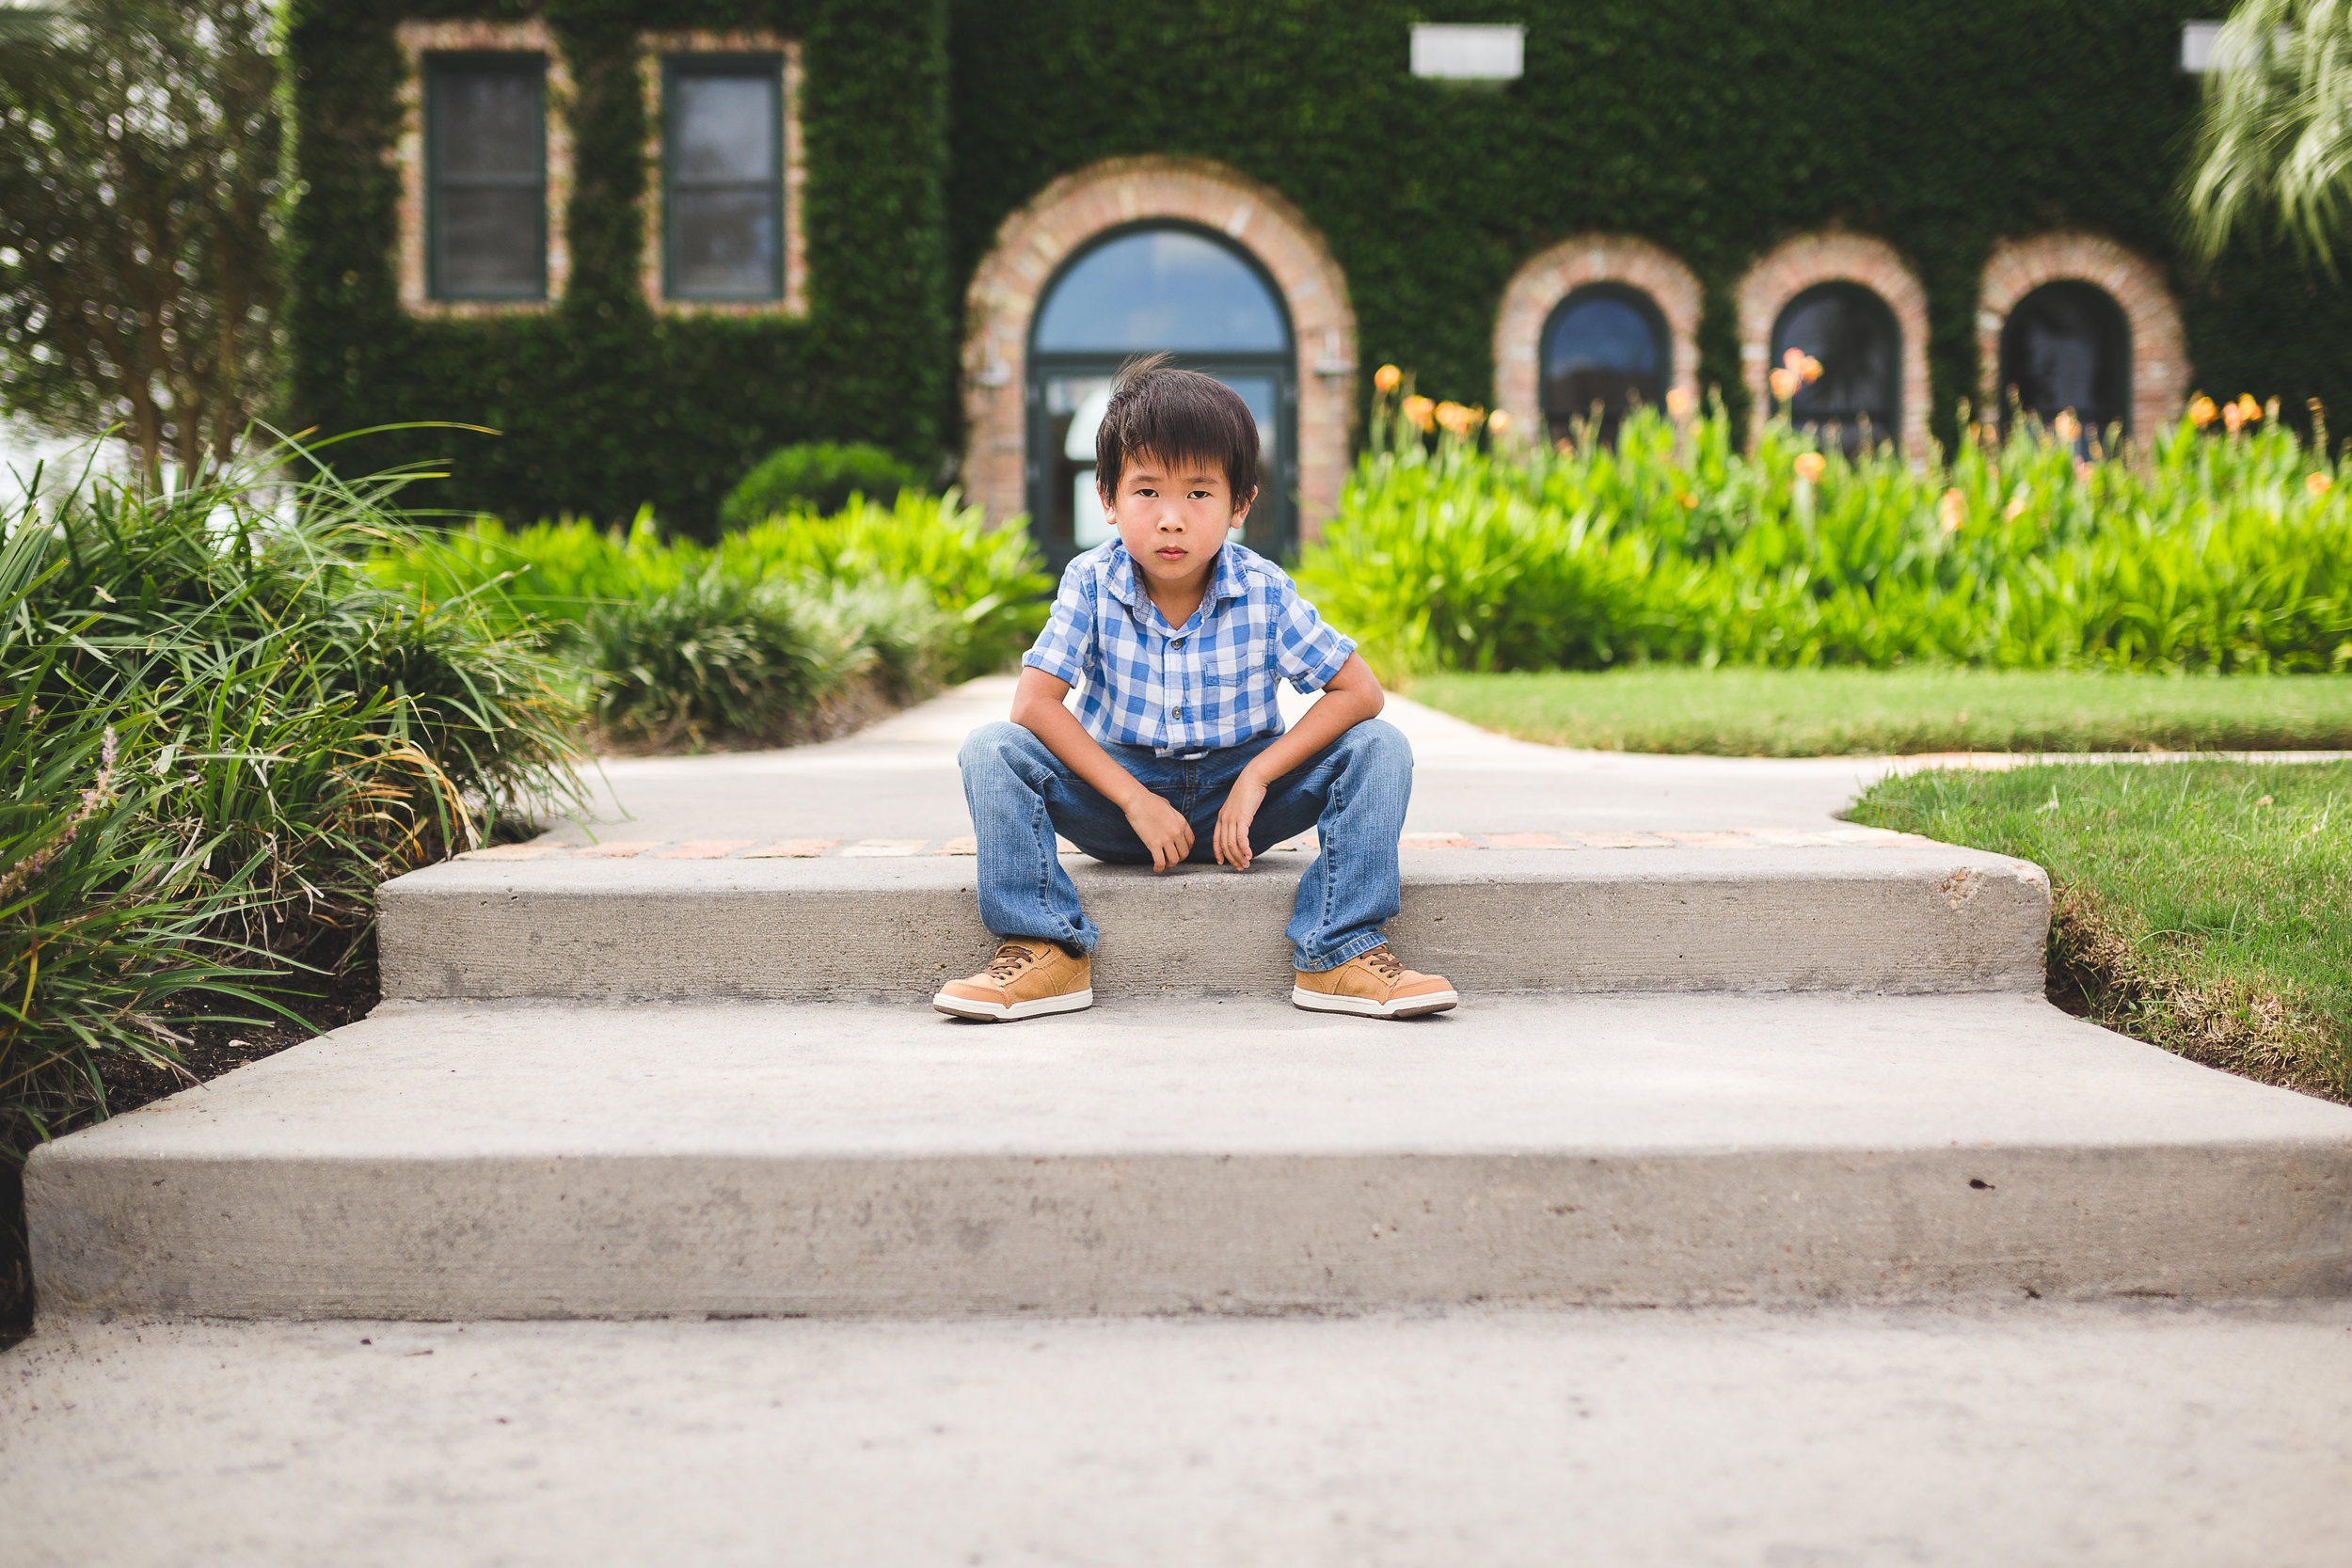 houston-tx-boy-childrens-family-photographer-photography-sugar-land-richmond-katy-tx.jpg